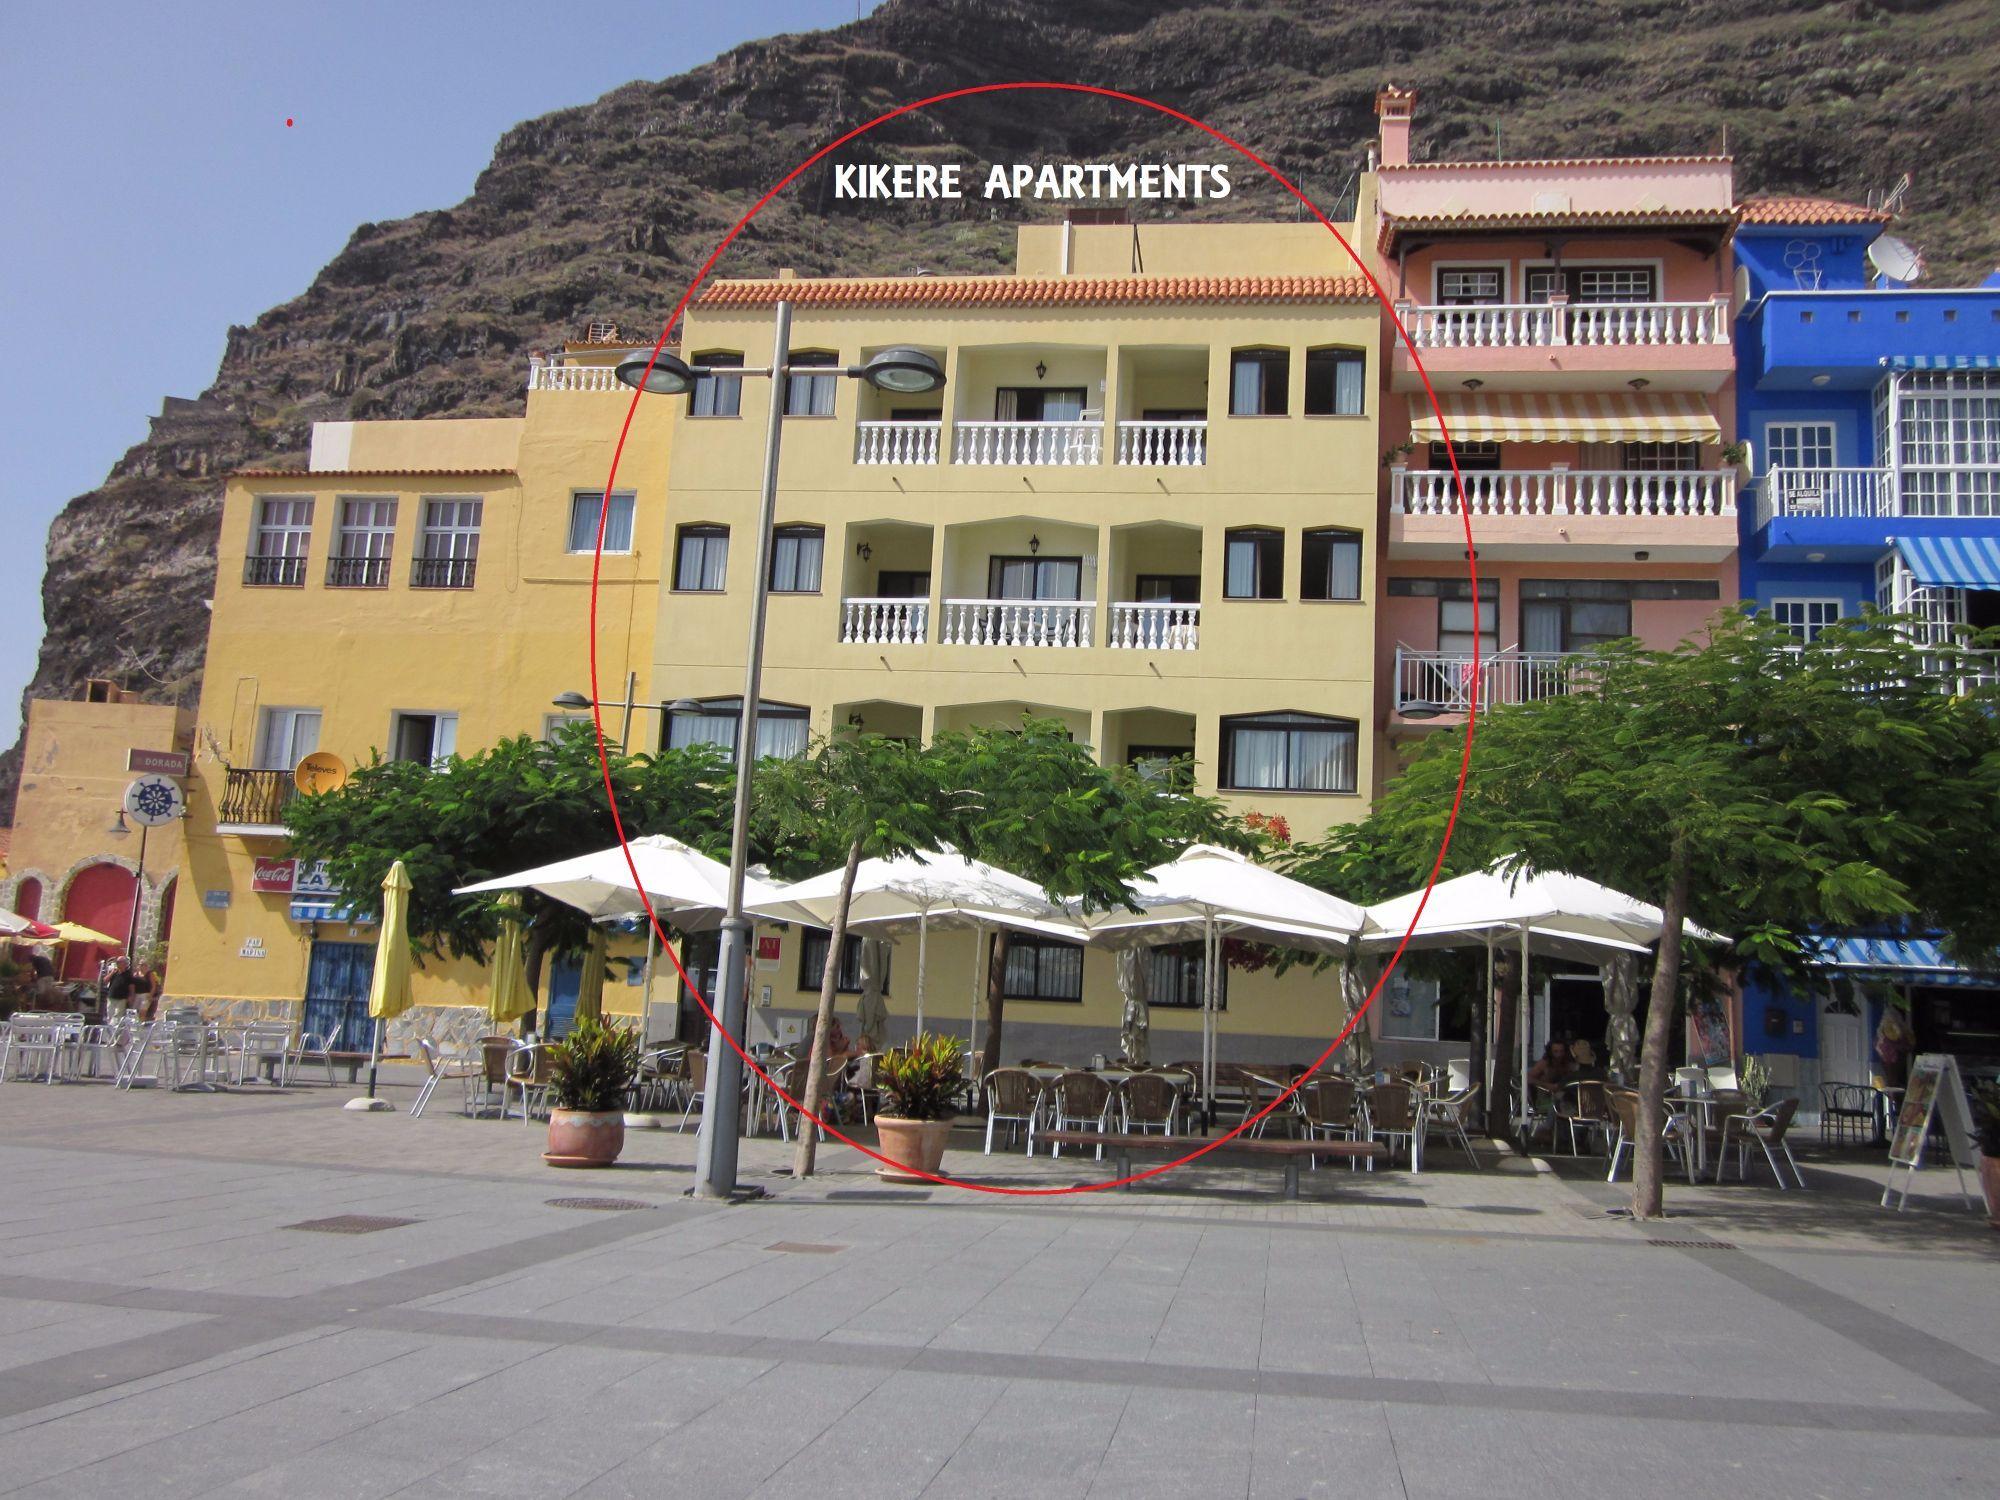 Kikere apartments puerto de tazacorte la palma canary islands